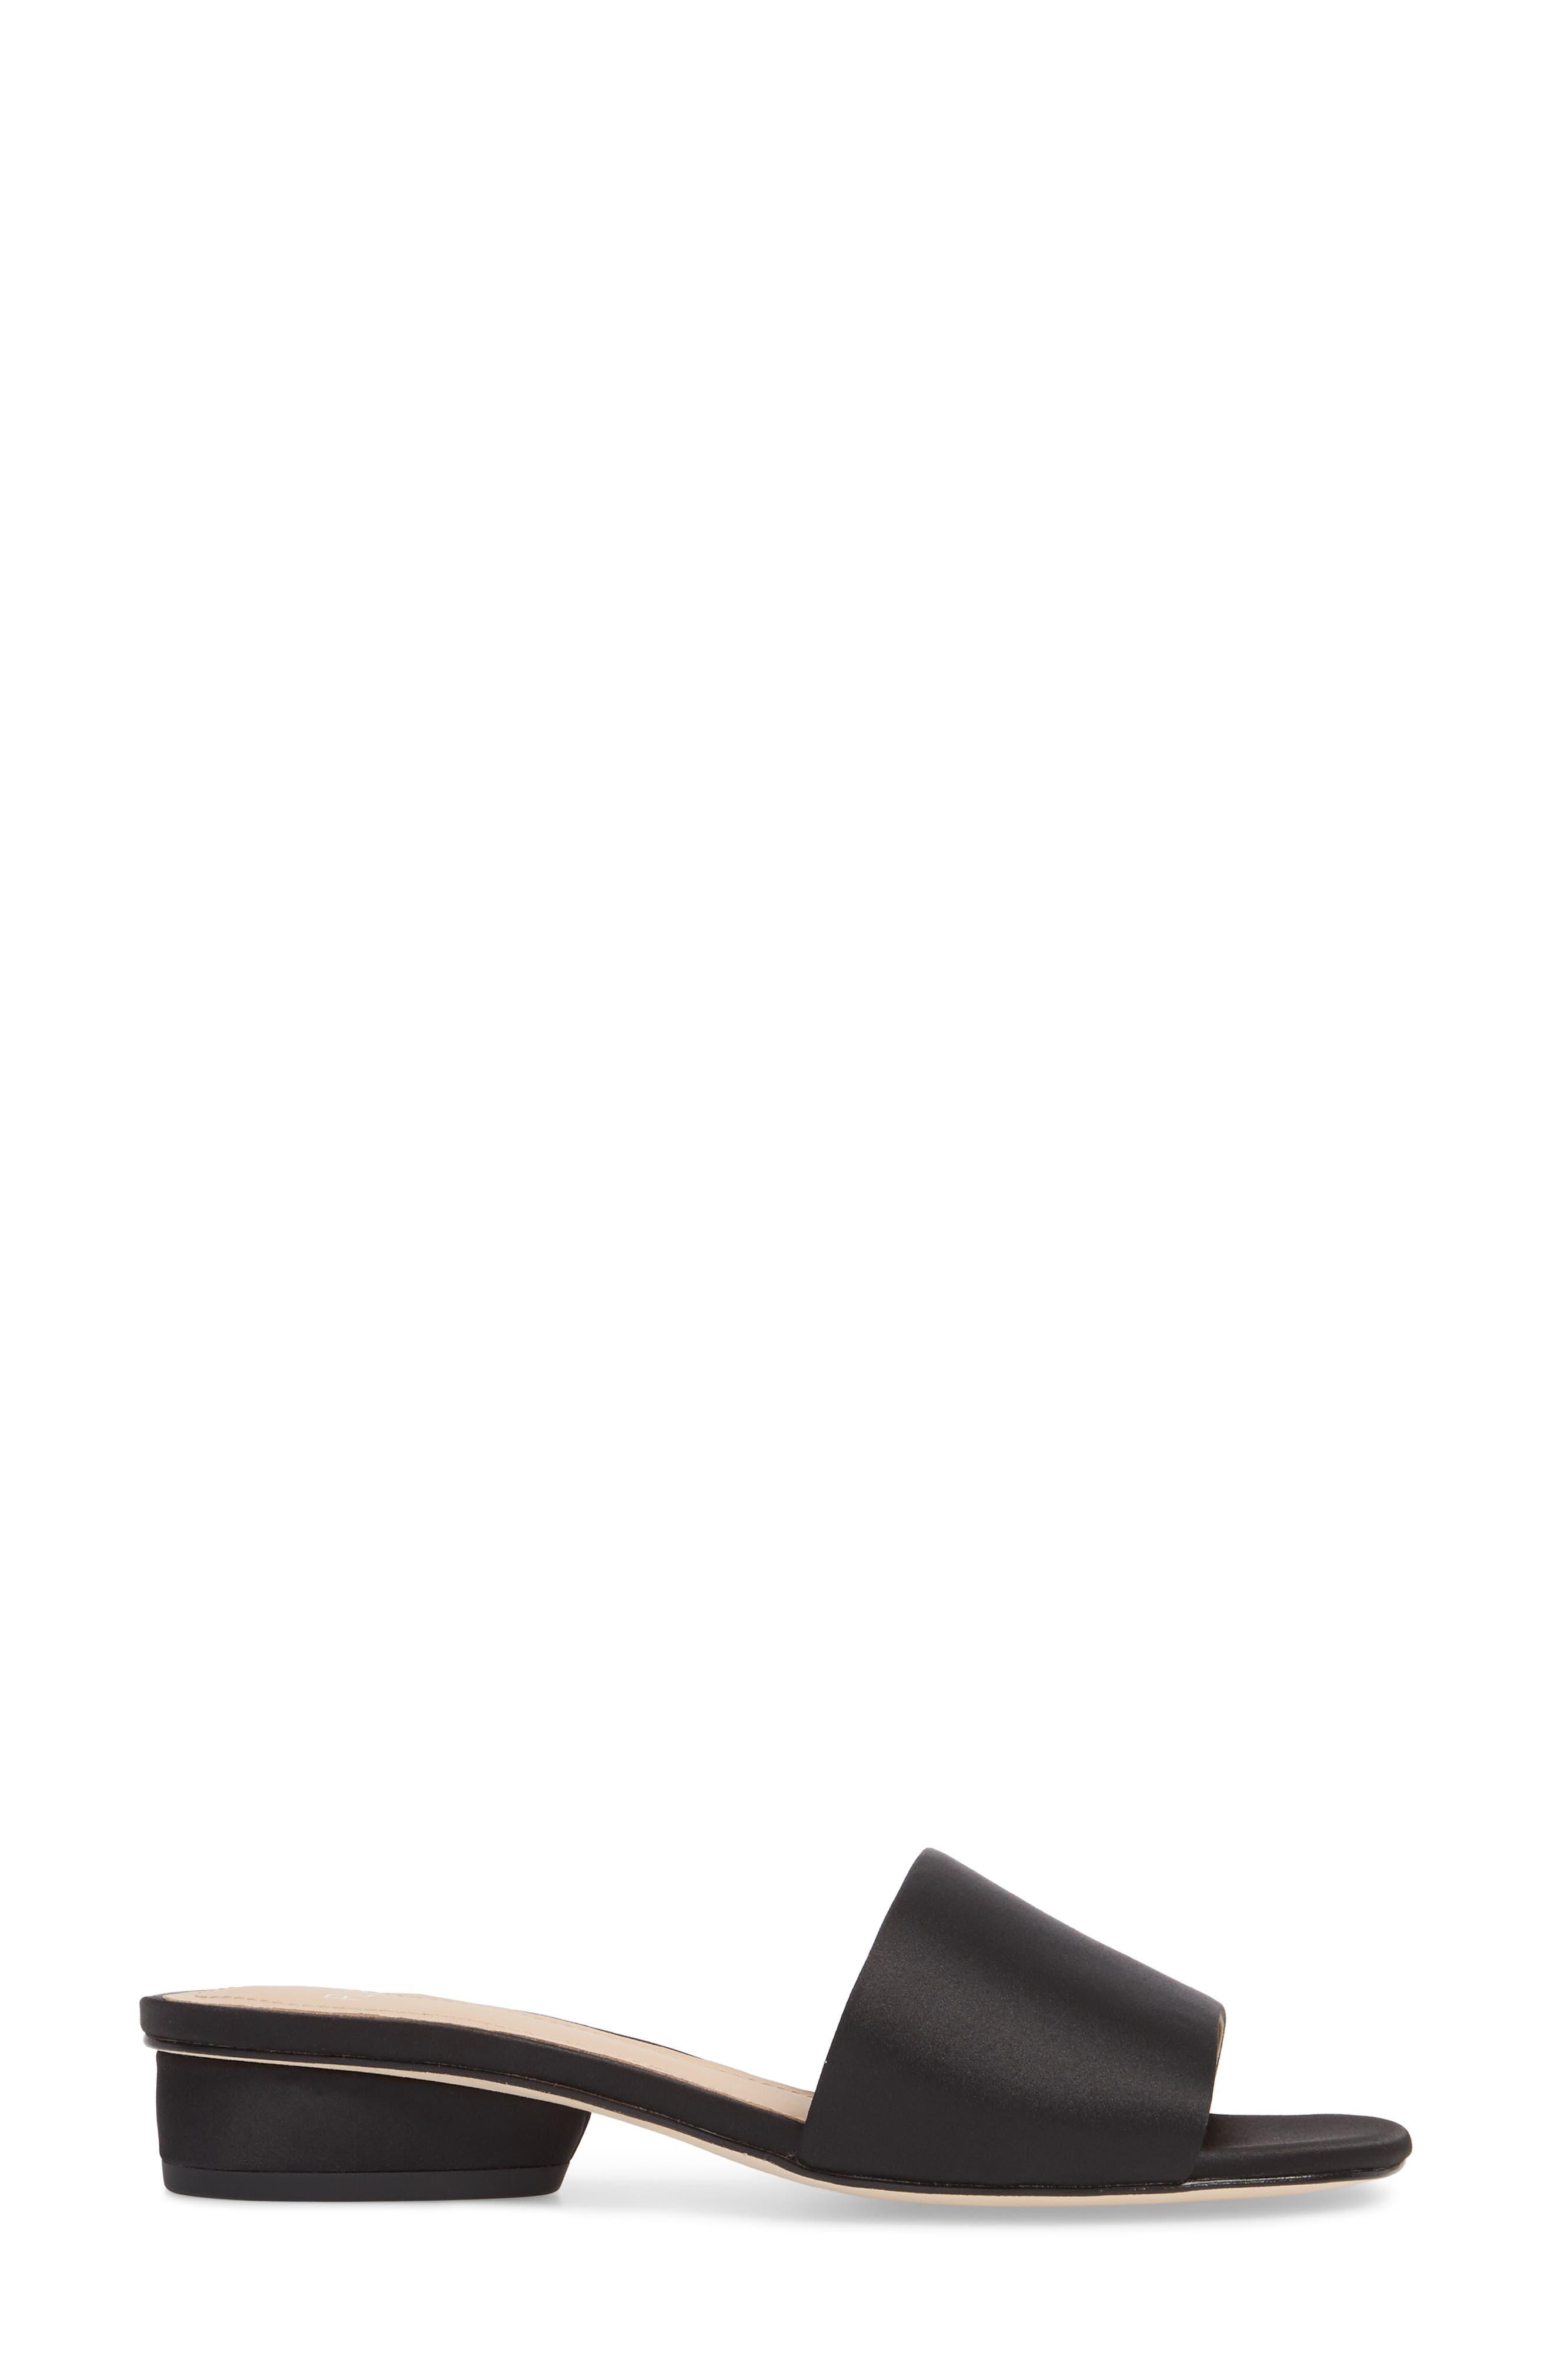 Mallory Slide Sandal,                             Alternate thumbnail 7, color,